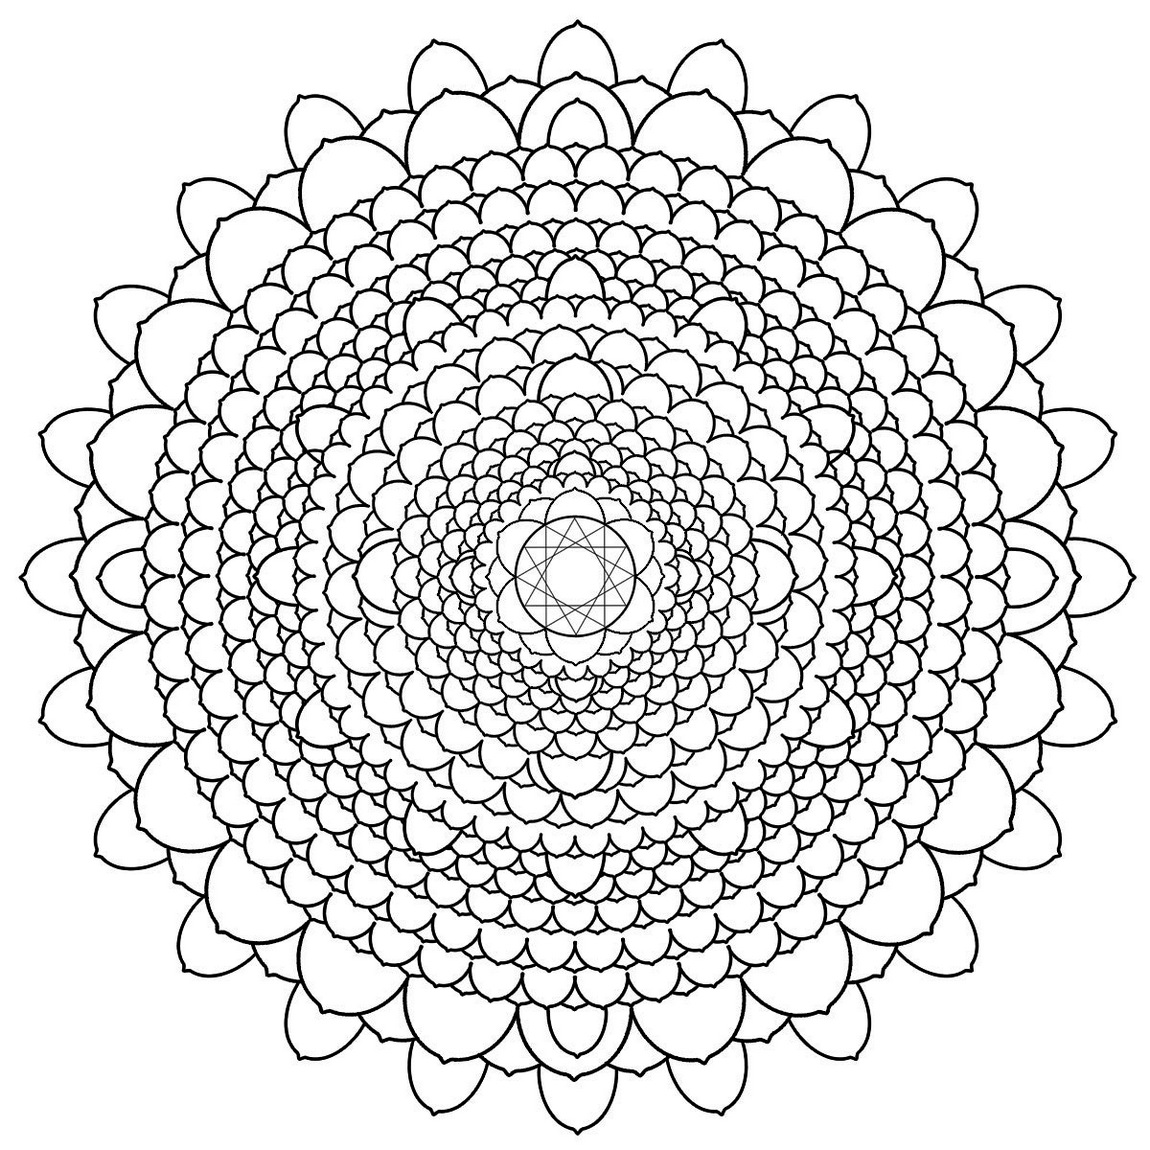 chakra-mandala-print-out-drawing